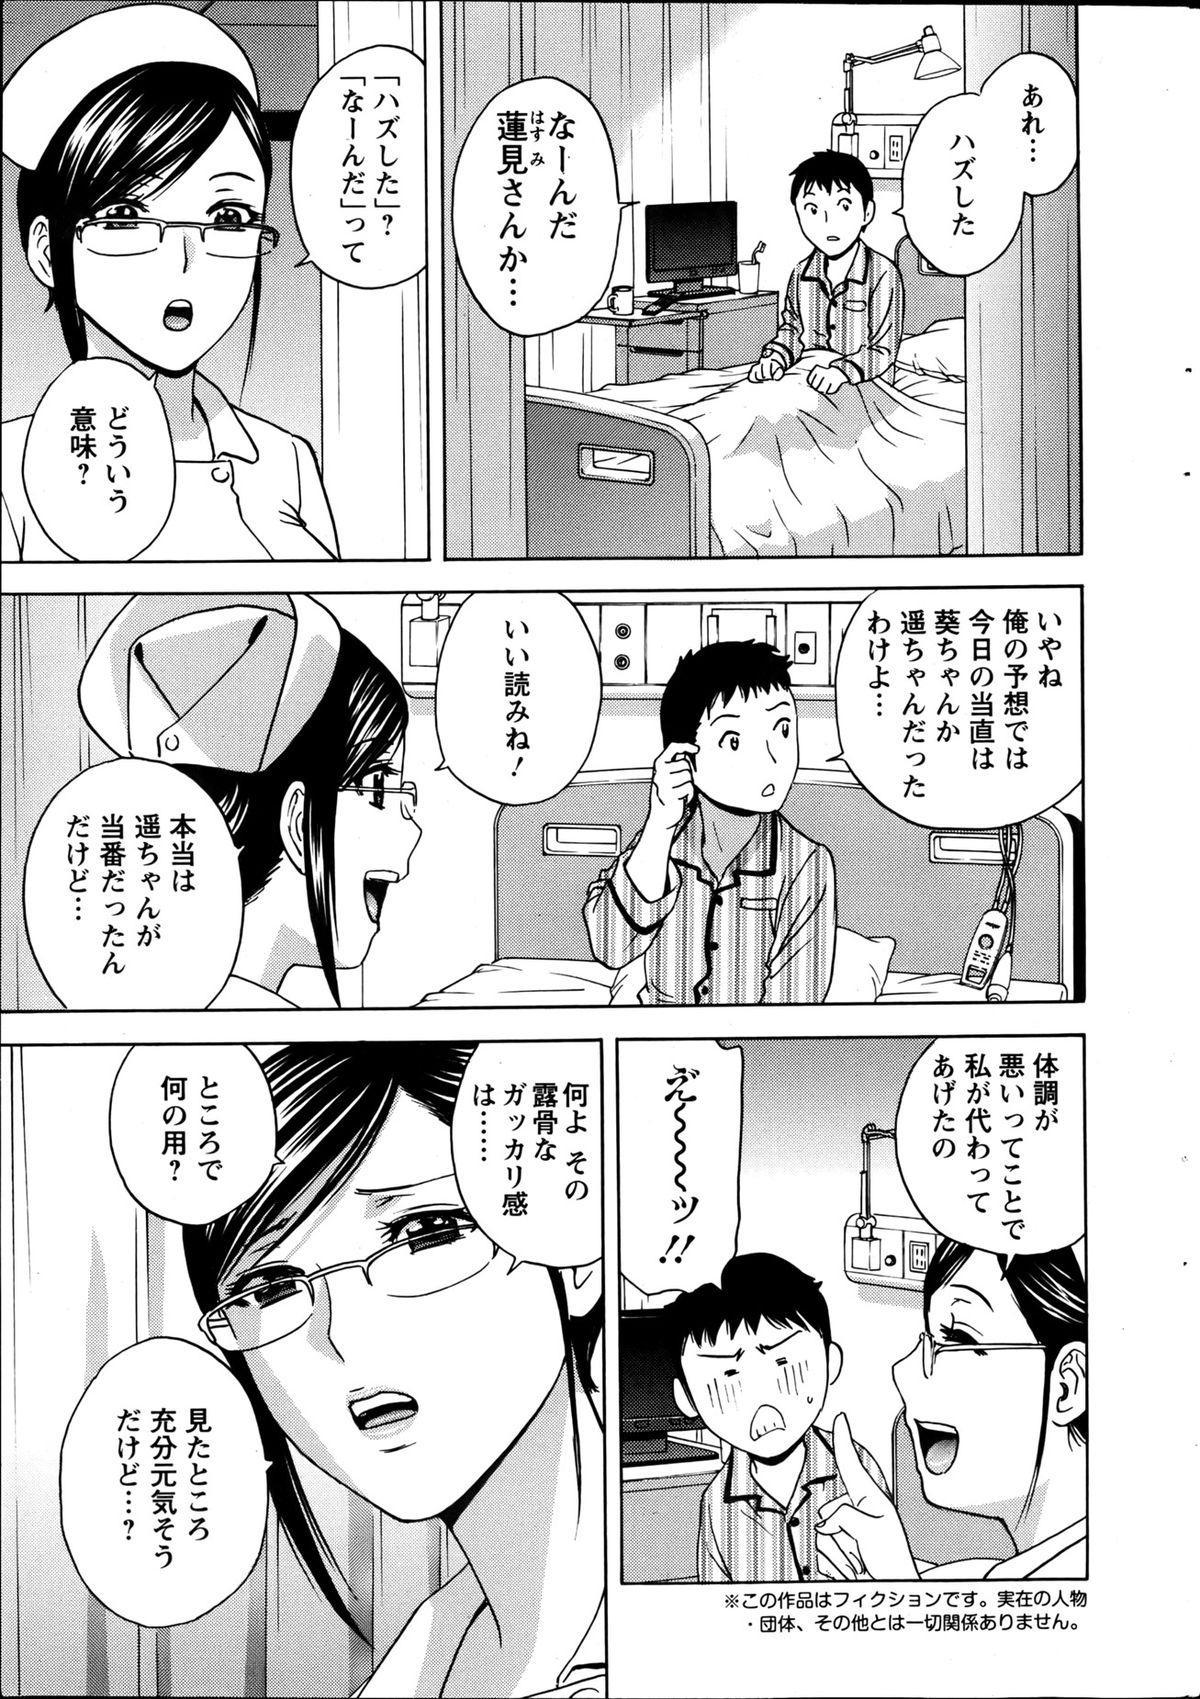 Hidemaru Nyuukan Madam Special 39